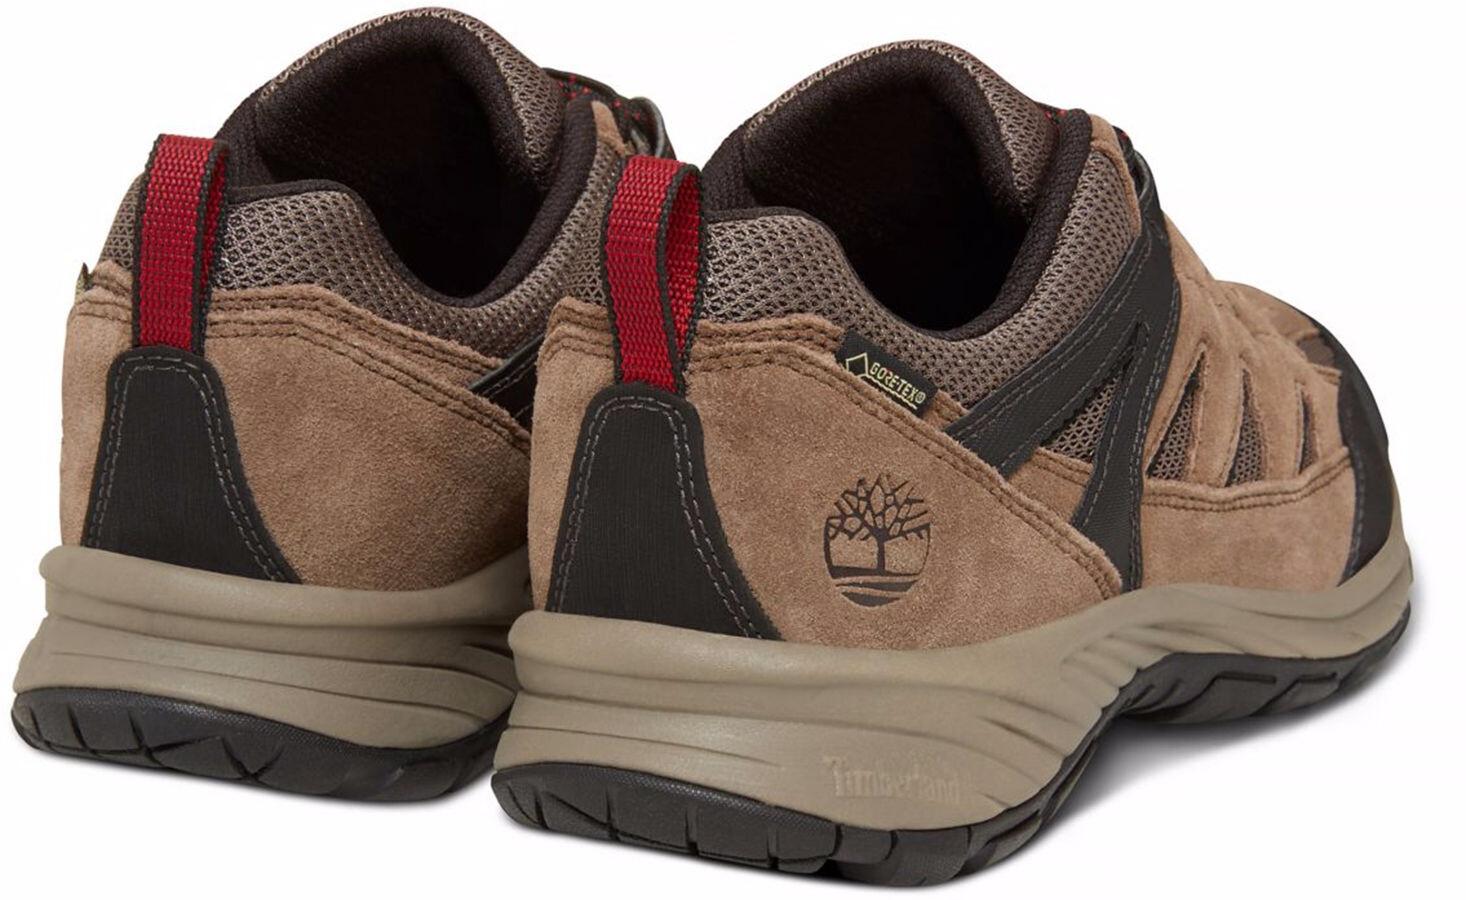 Marron Sur Homme Sadler Chaussures Pass Fl Timberland Gtx Low R0wT1z